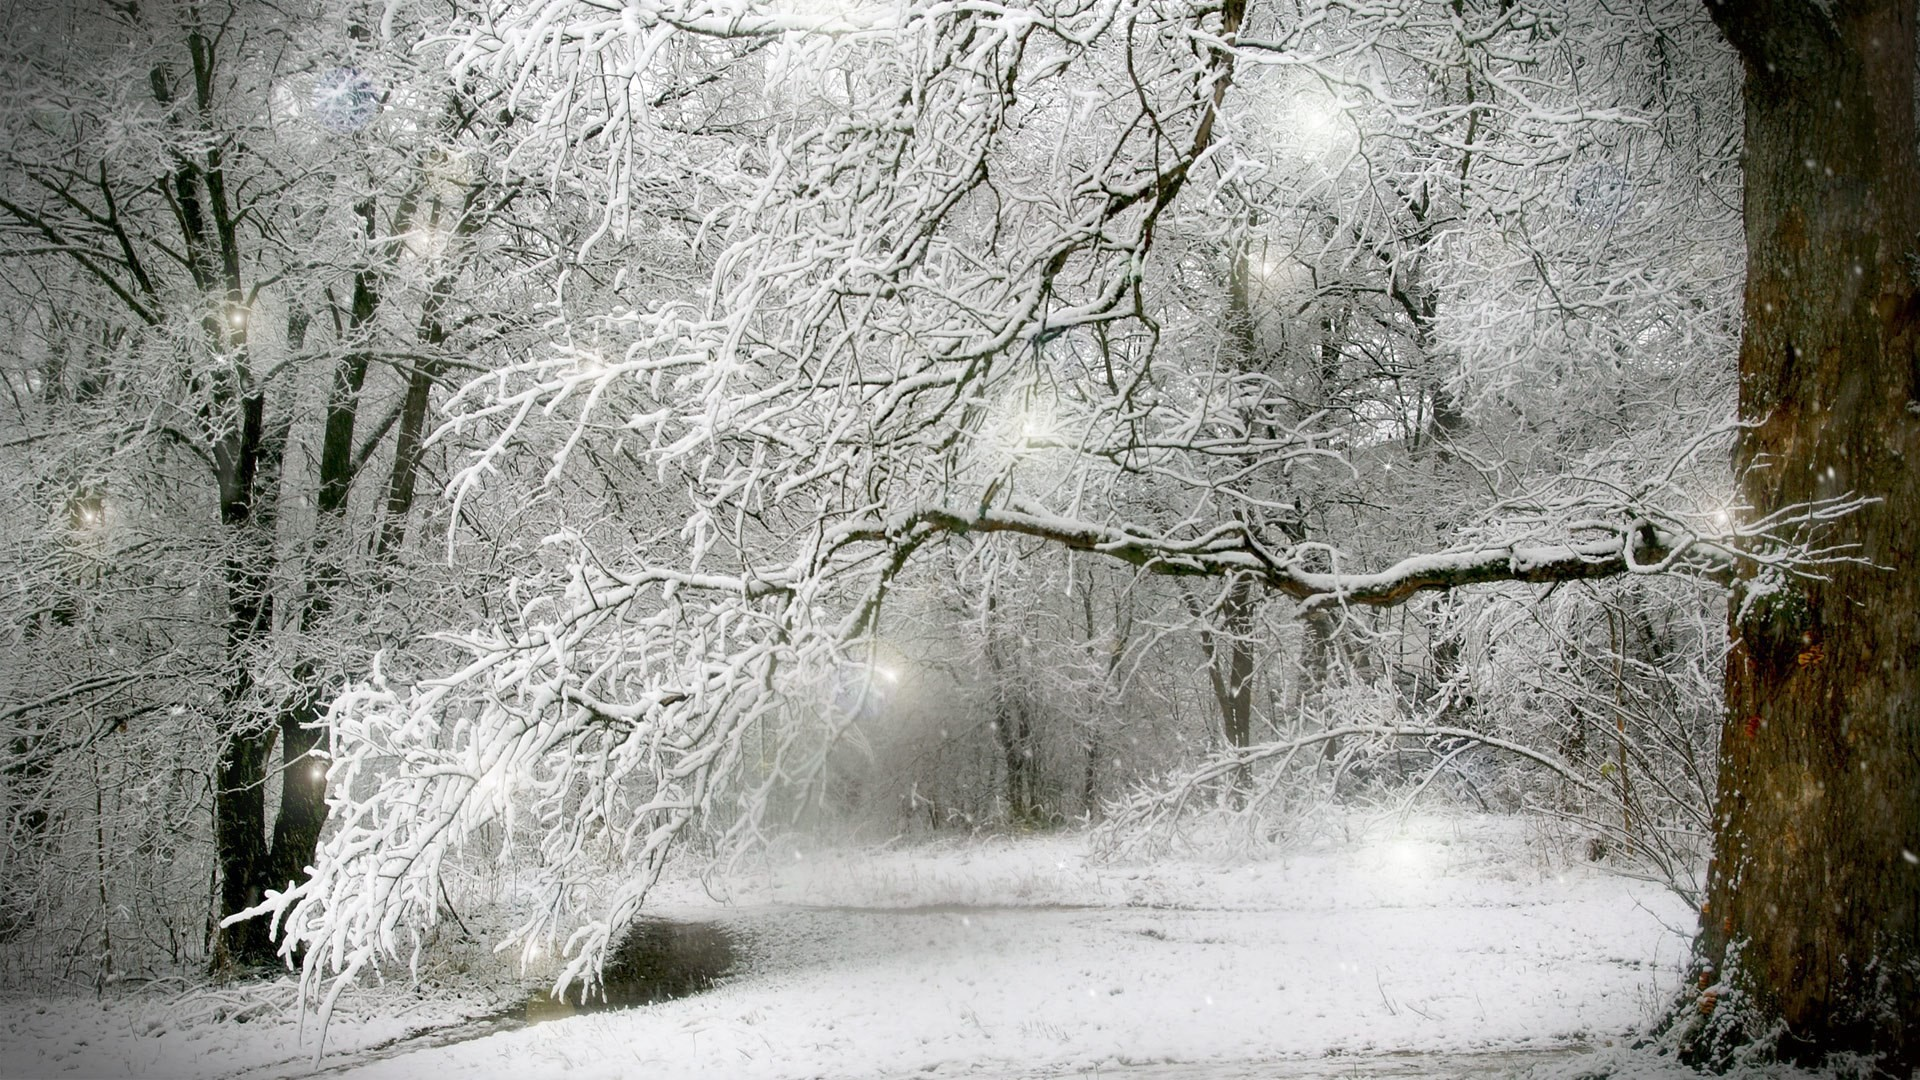 1920 x 1080 px winter snow scenes wallpaper: Full HD Pictures by Lawton  Kingsman